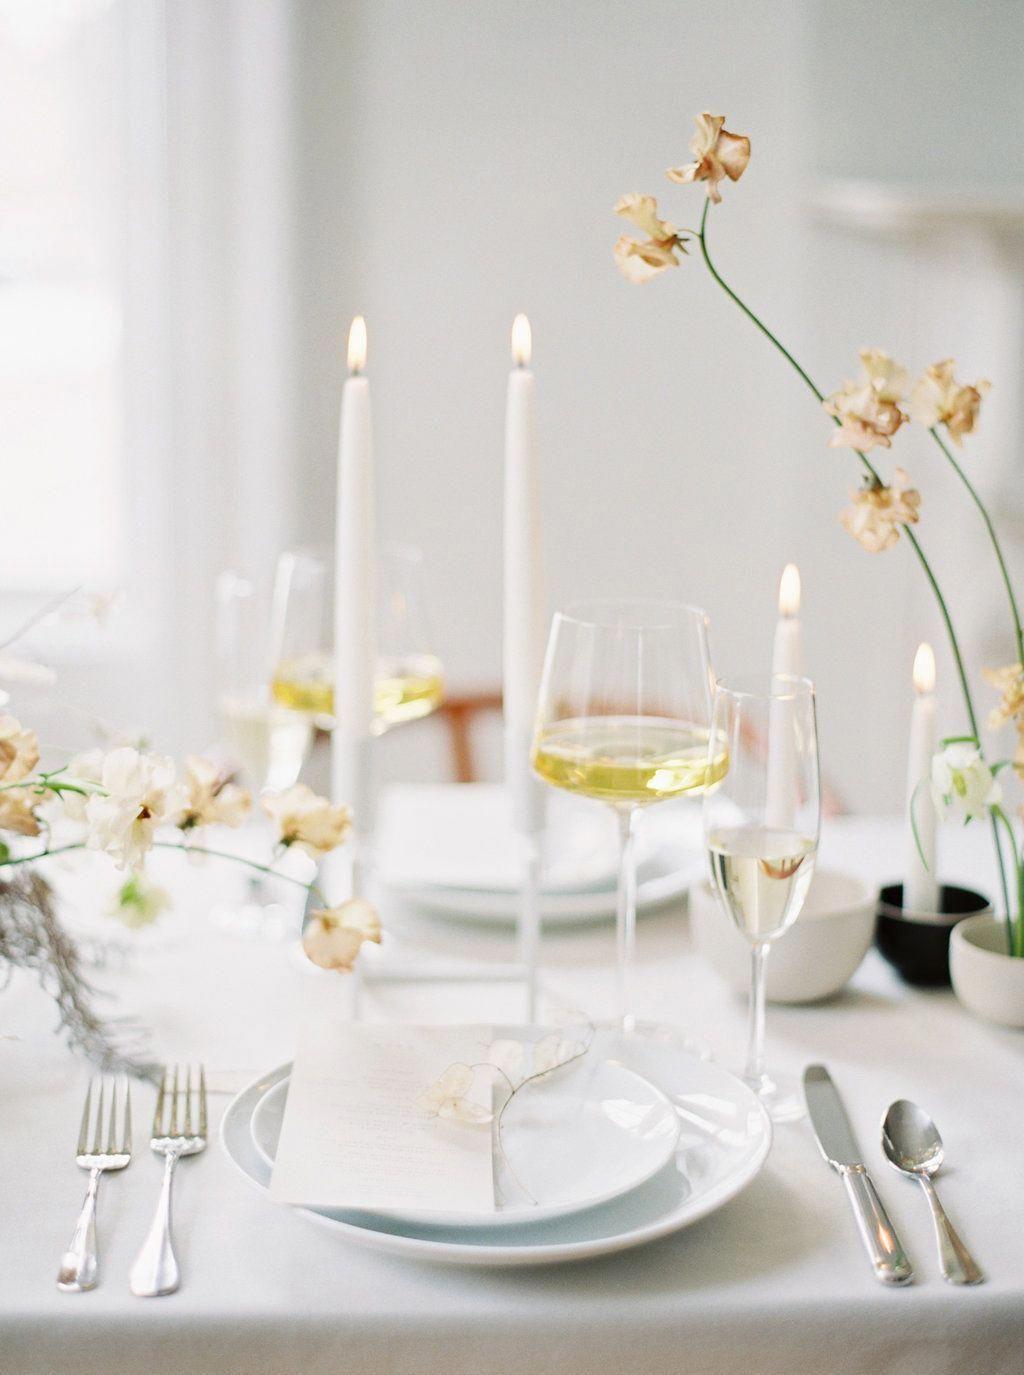 Adaptable Centralized Wedding Centerpieces Reveal My Mystery Coupon Wedding Table Wedding Table Settings Wedding Table Centerpieces